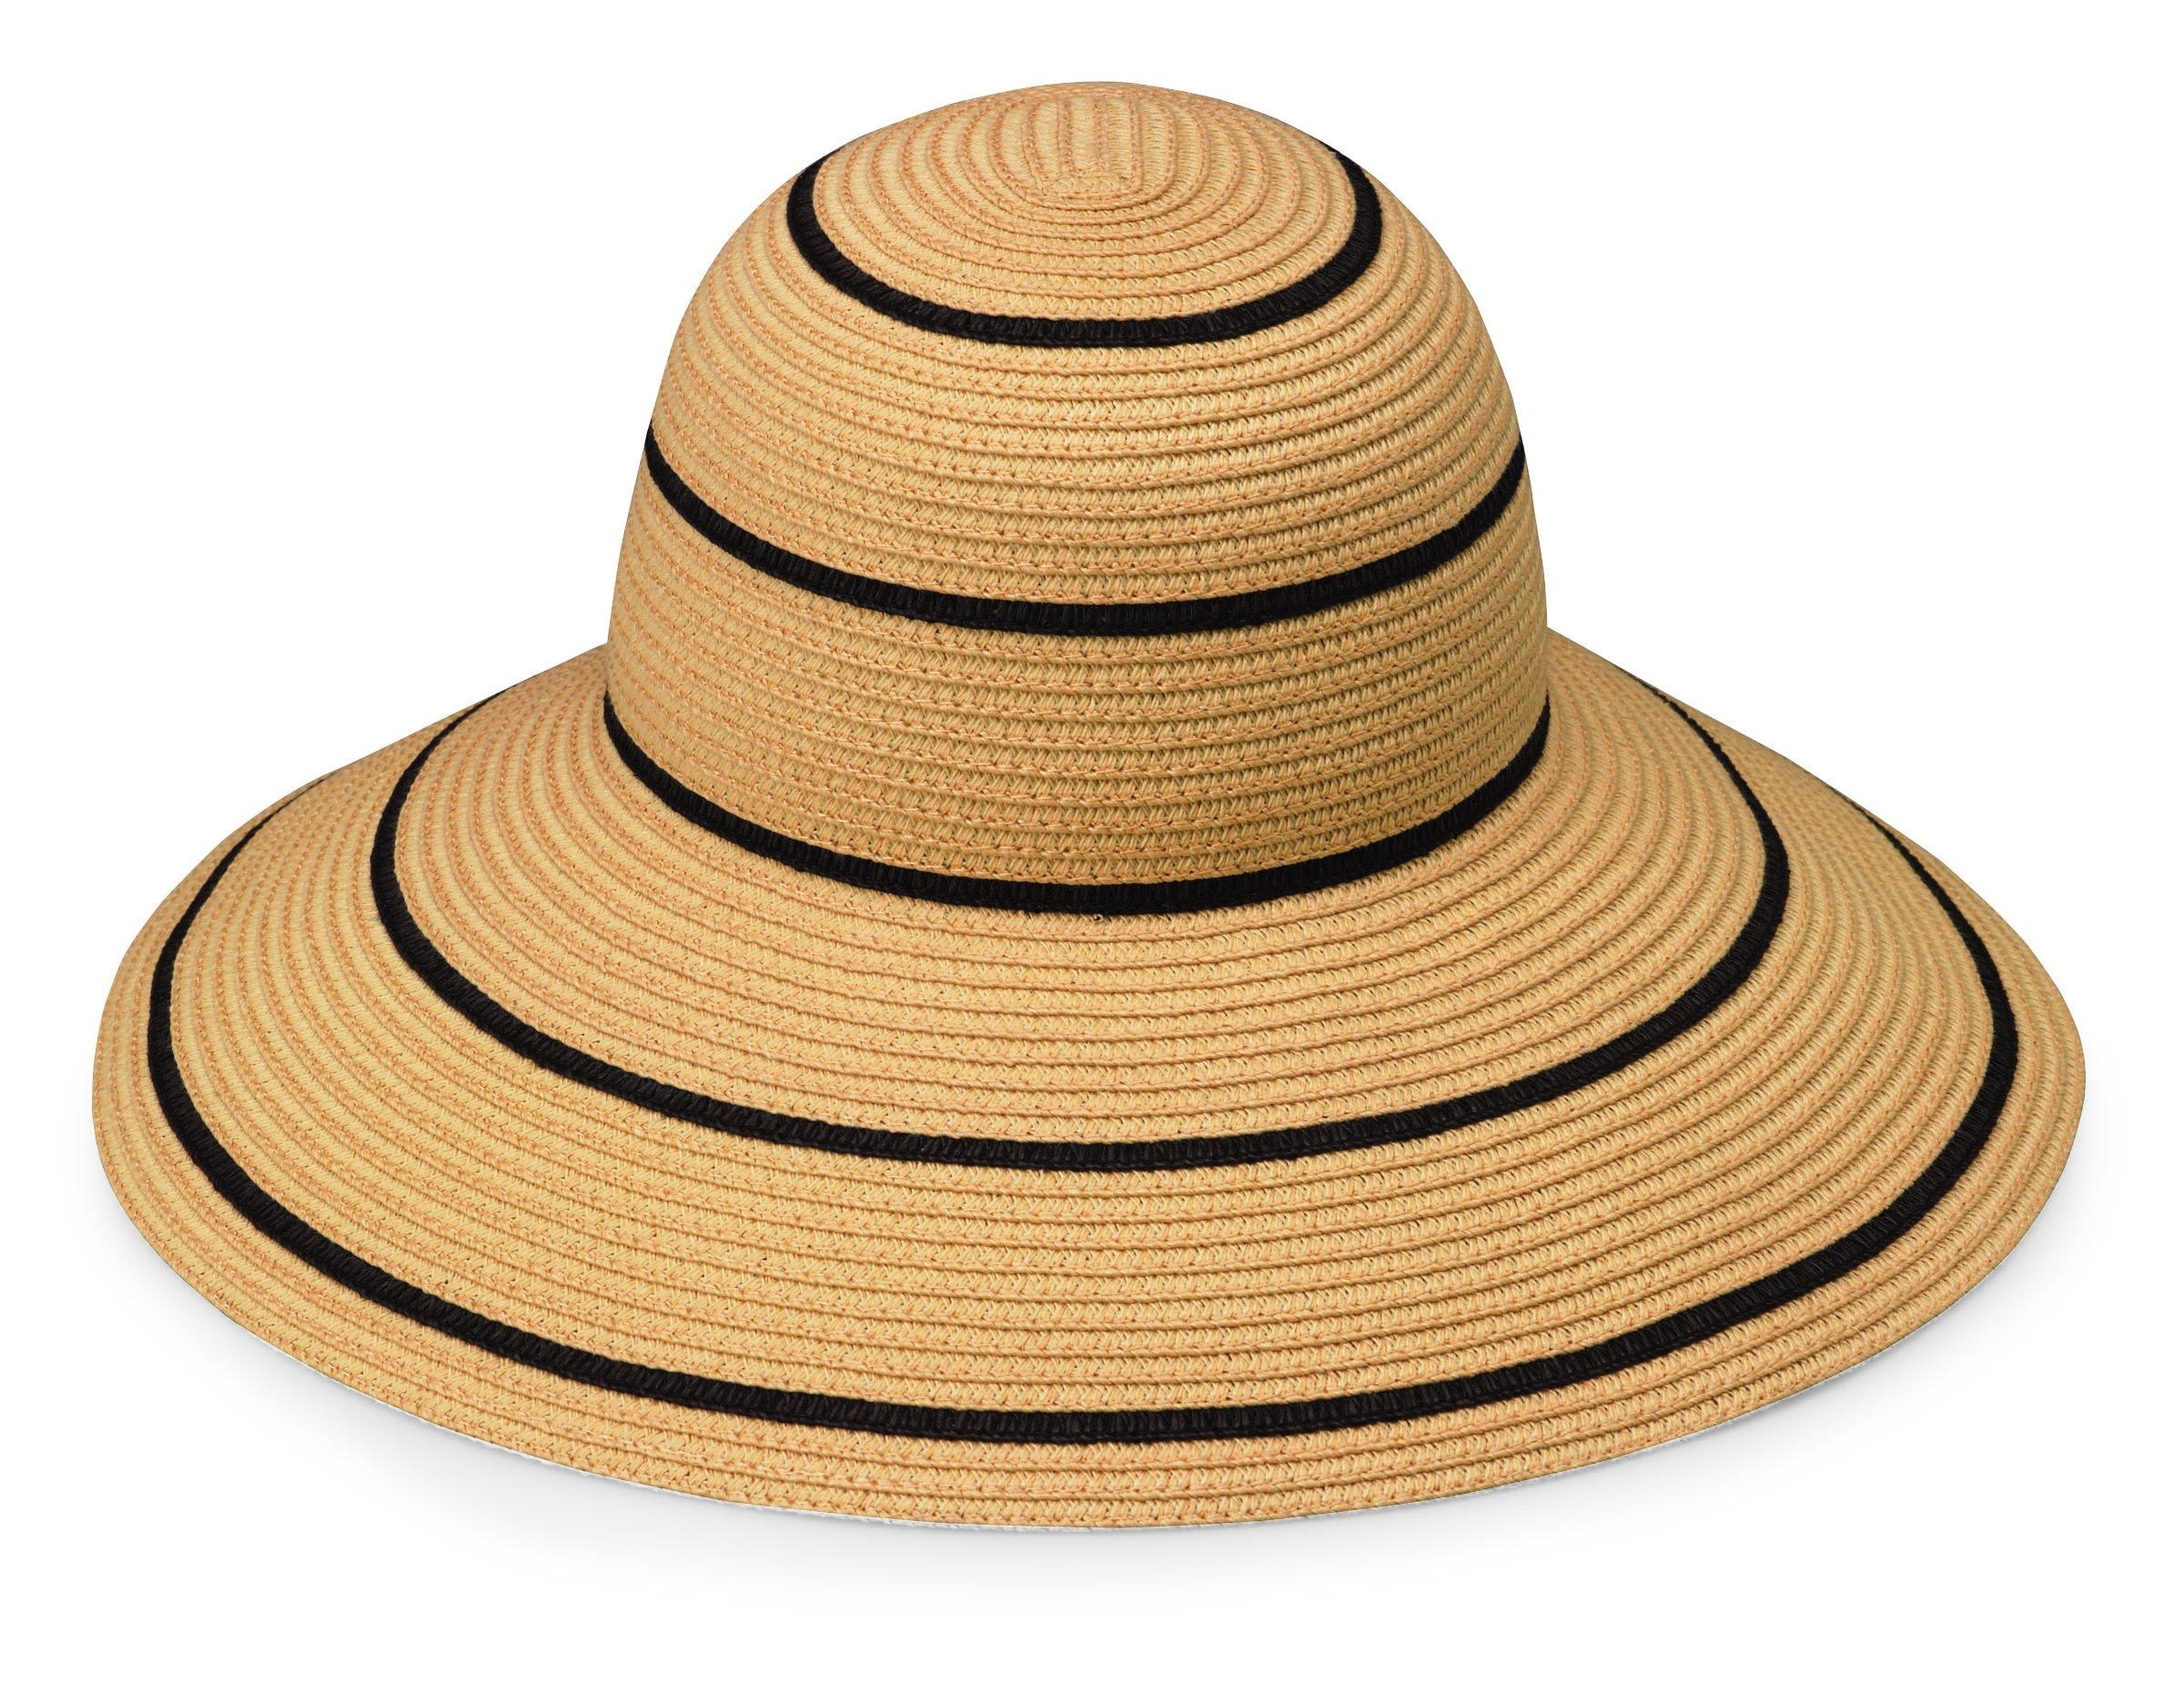 Wallaroo Hat Company Women's Savannah Sun Hat - Camel/Black Stripes - UPF 50+